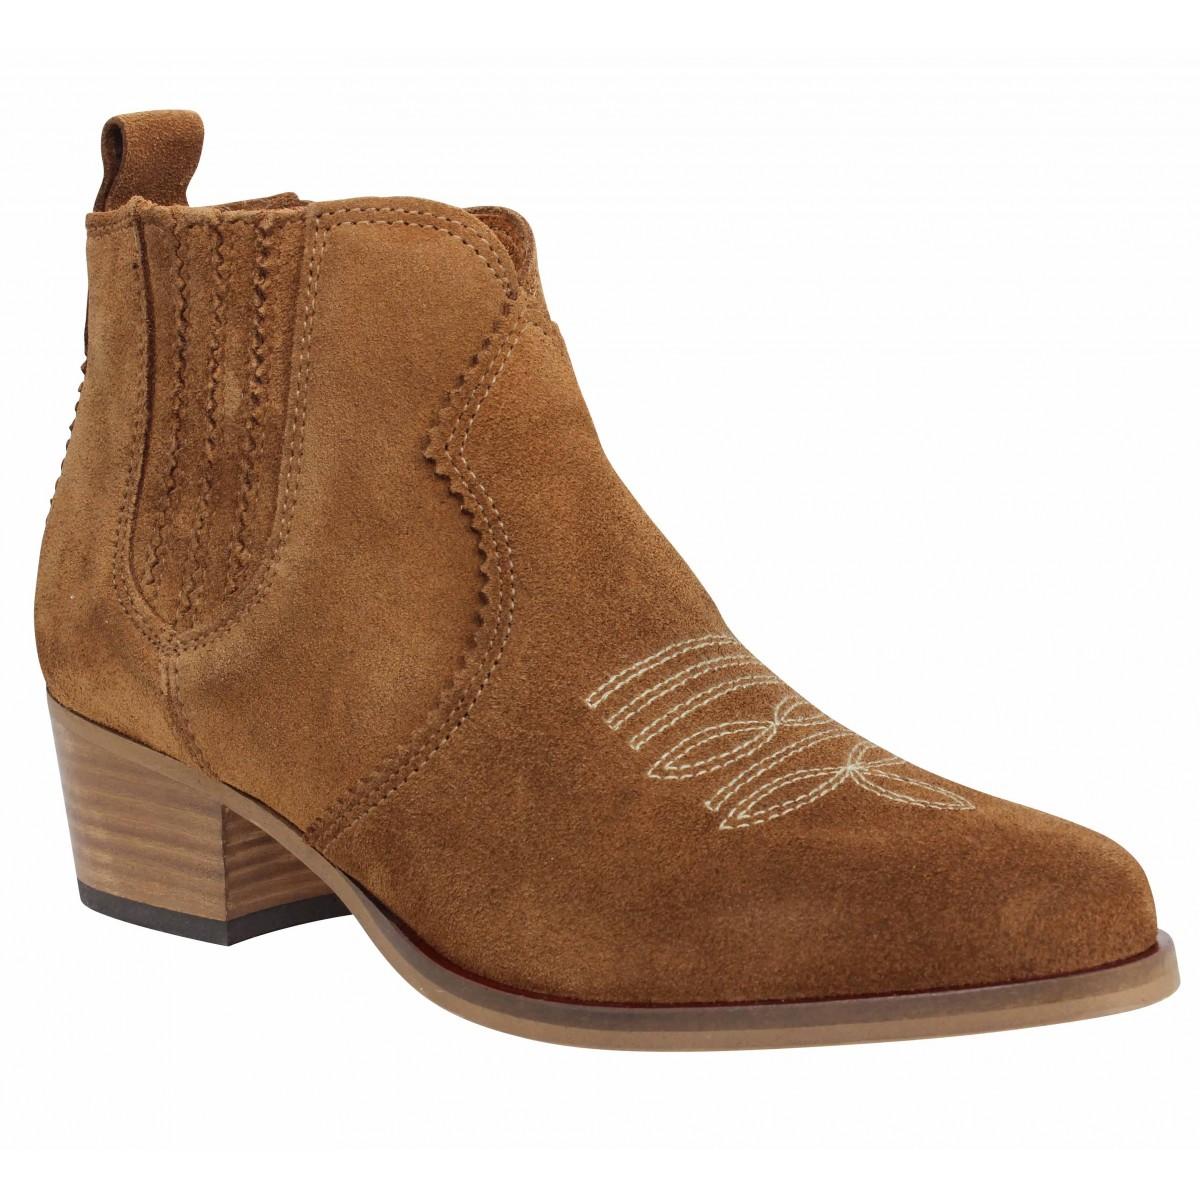 Bottines SCHMOOVE Polly Boots suede Femme Cognac